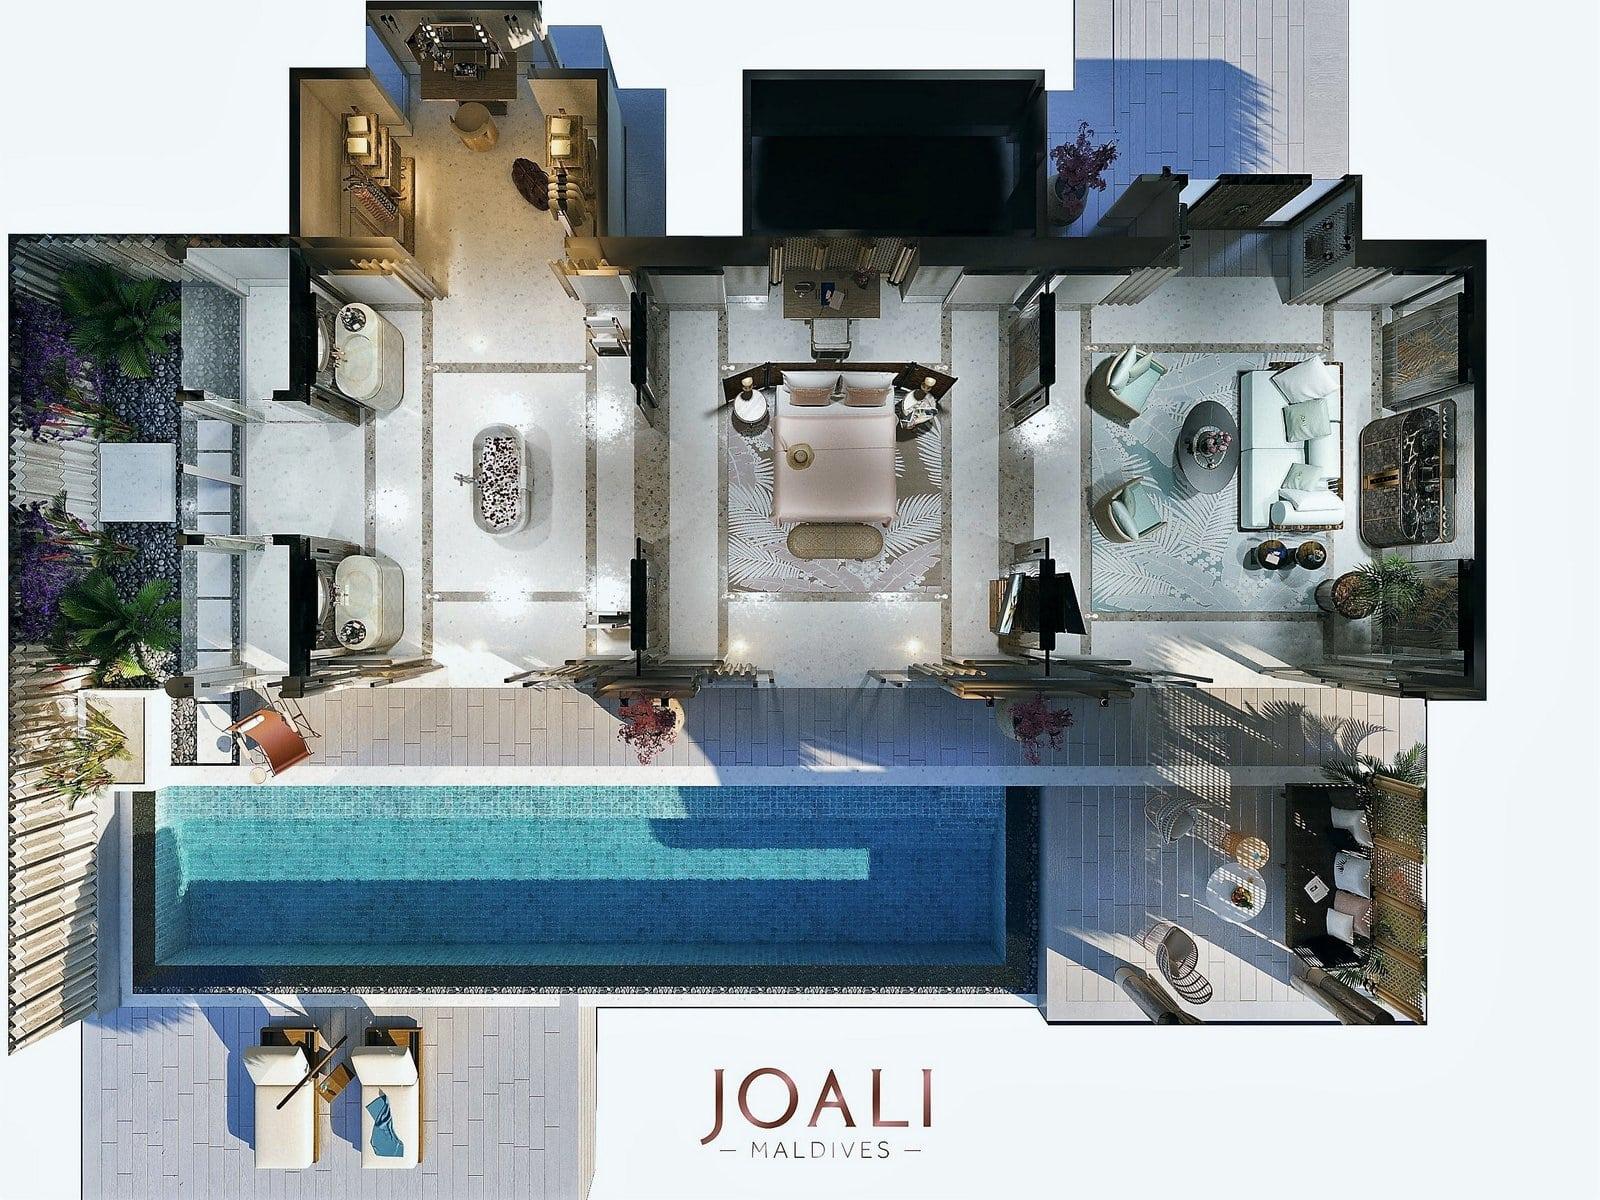 Мальдивы, отель Joali Maldives, план-схема номера Luxury Water Villa with Pool